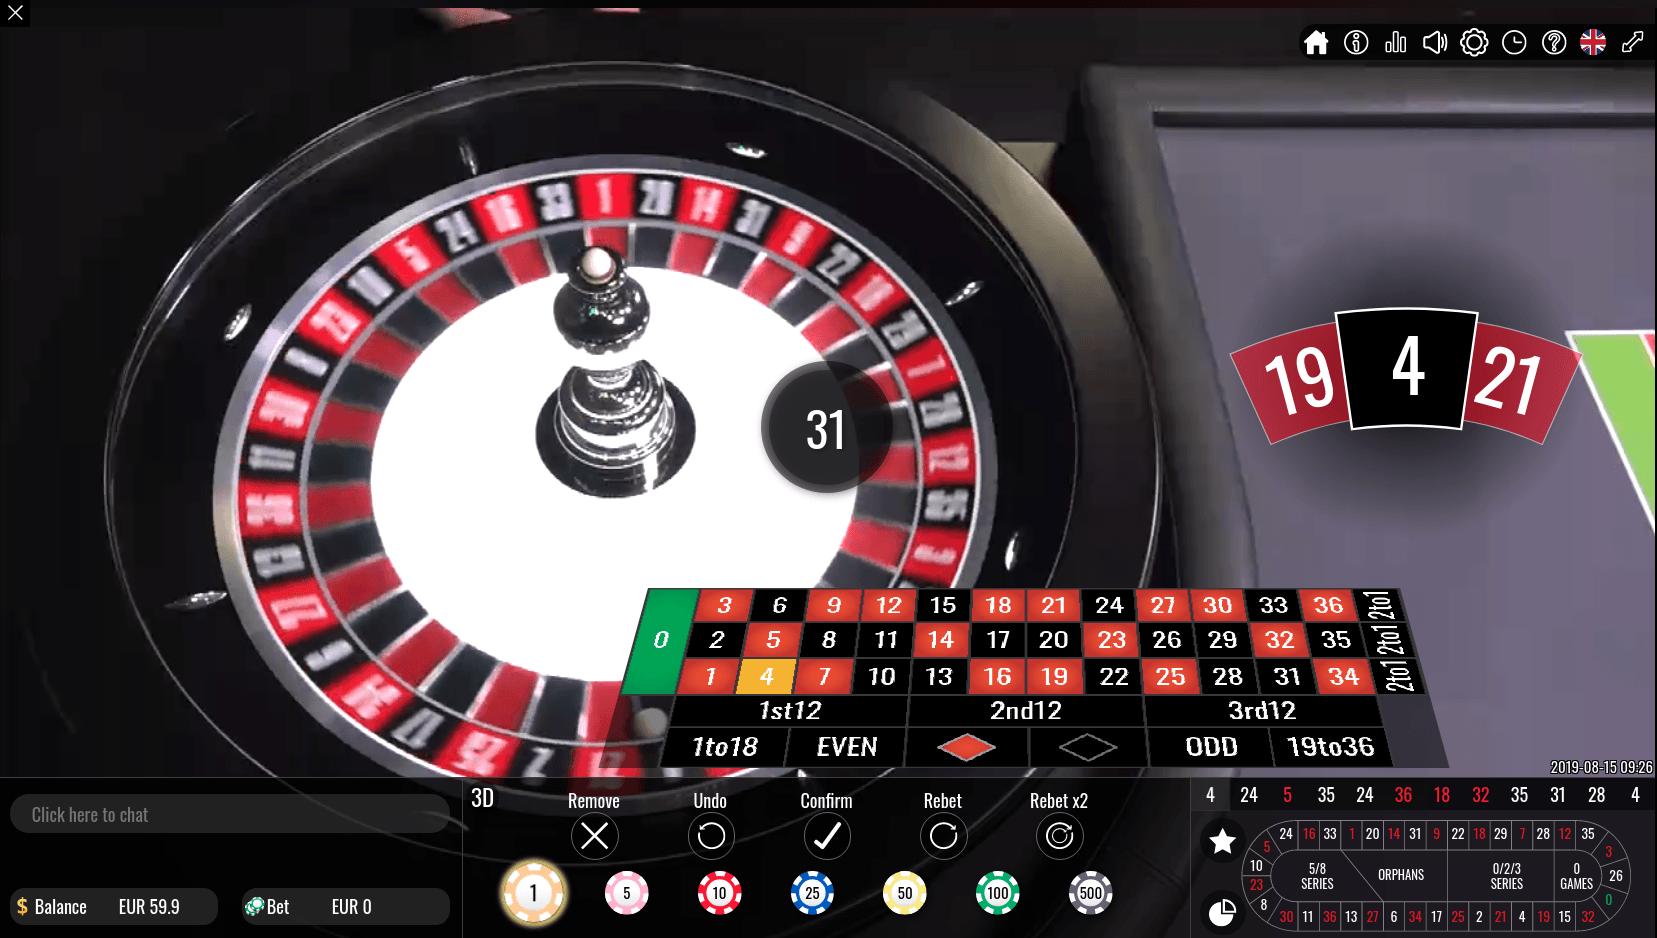 Casinos foxium português video 18004